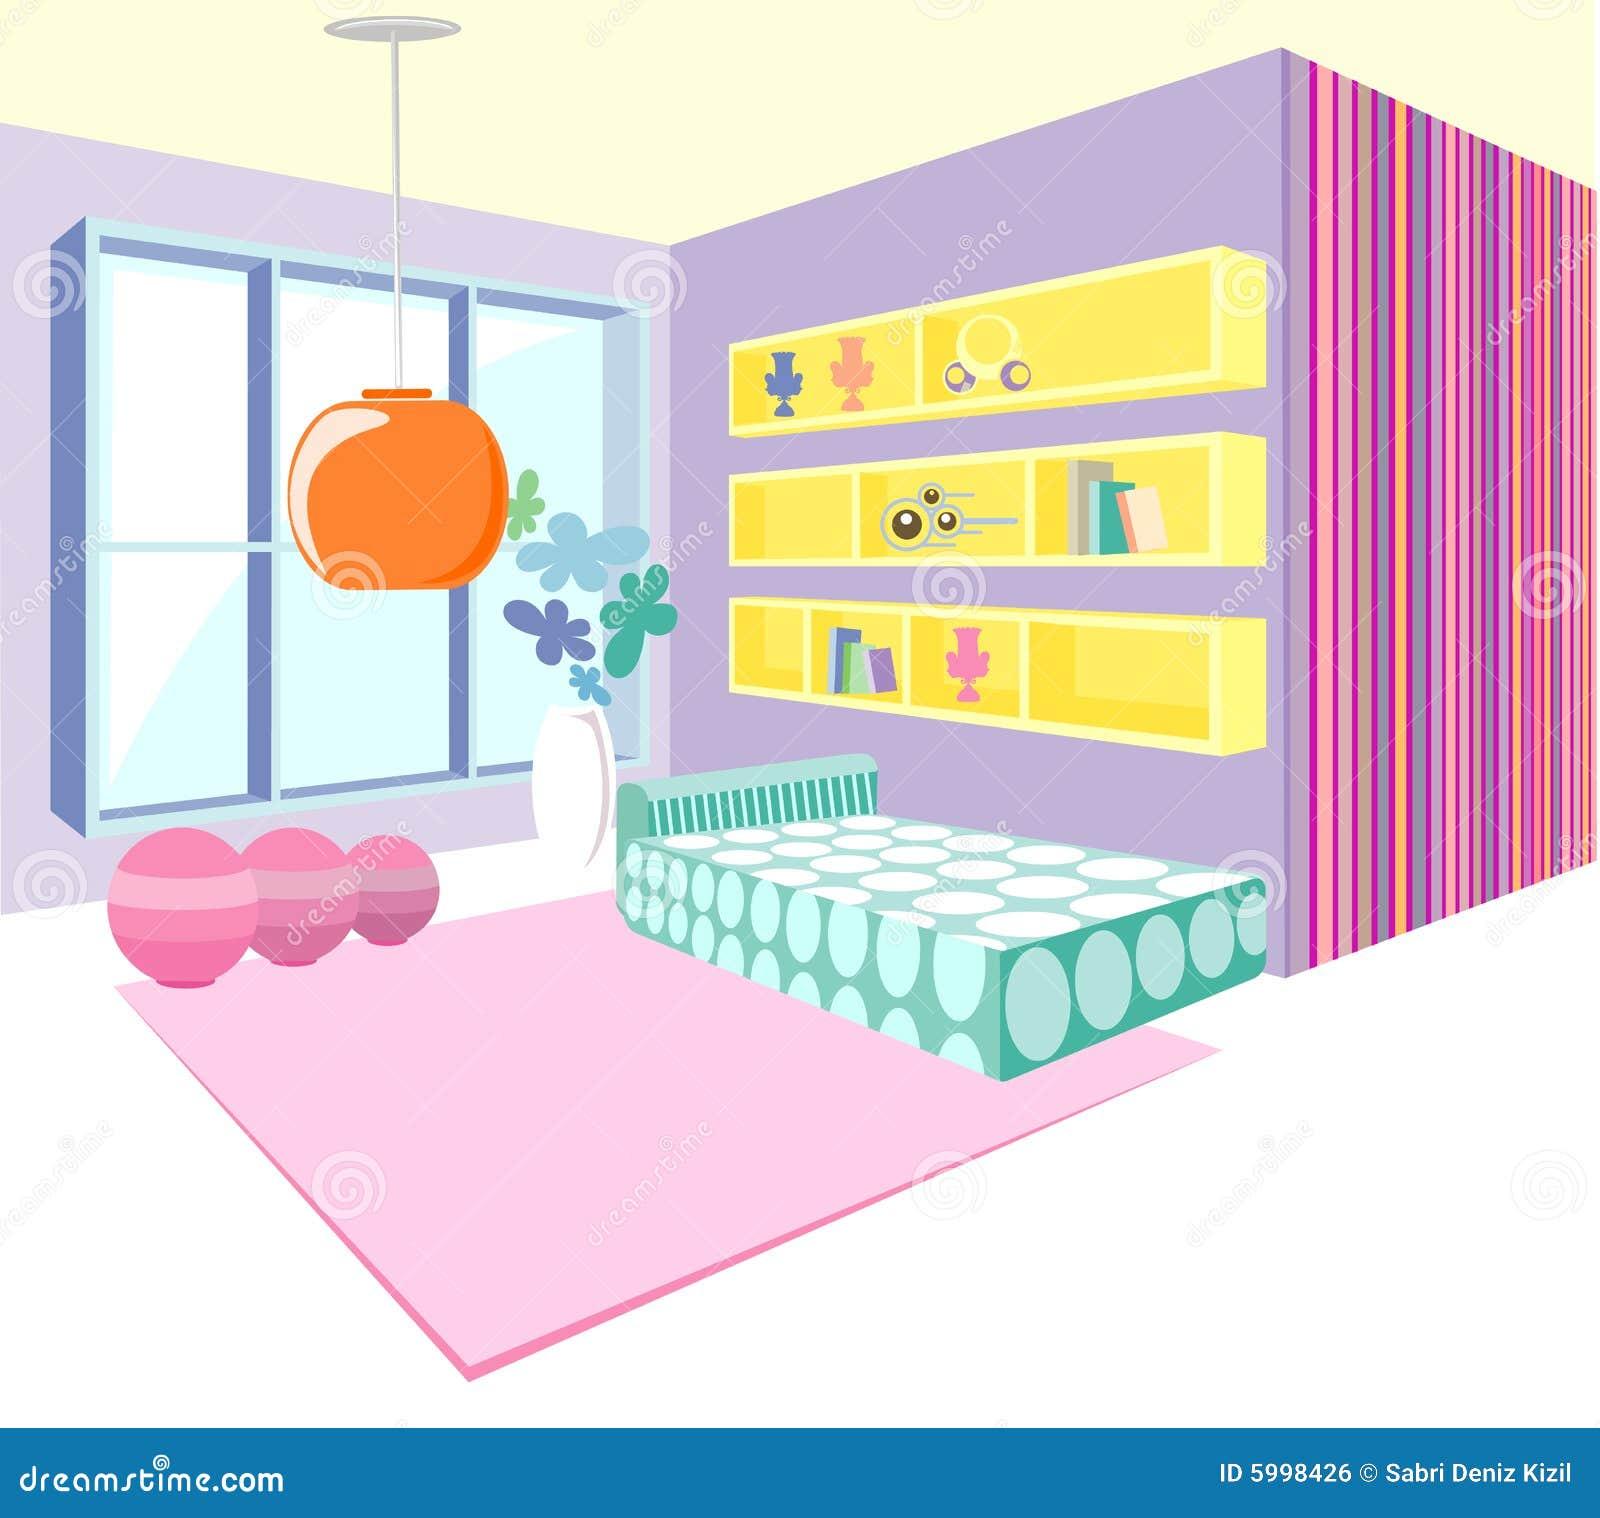 Modern Interior Vector Royalty Free Stock Image Image: 5998426 - Living Room Interior Design With Outline Furniture Set VectorIllustration 271360529